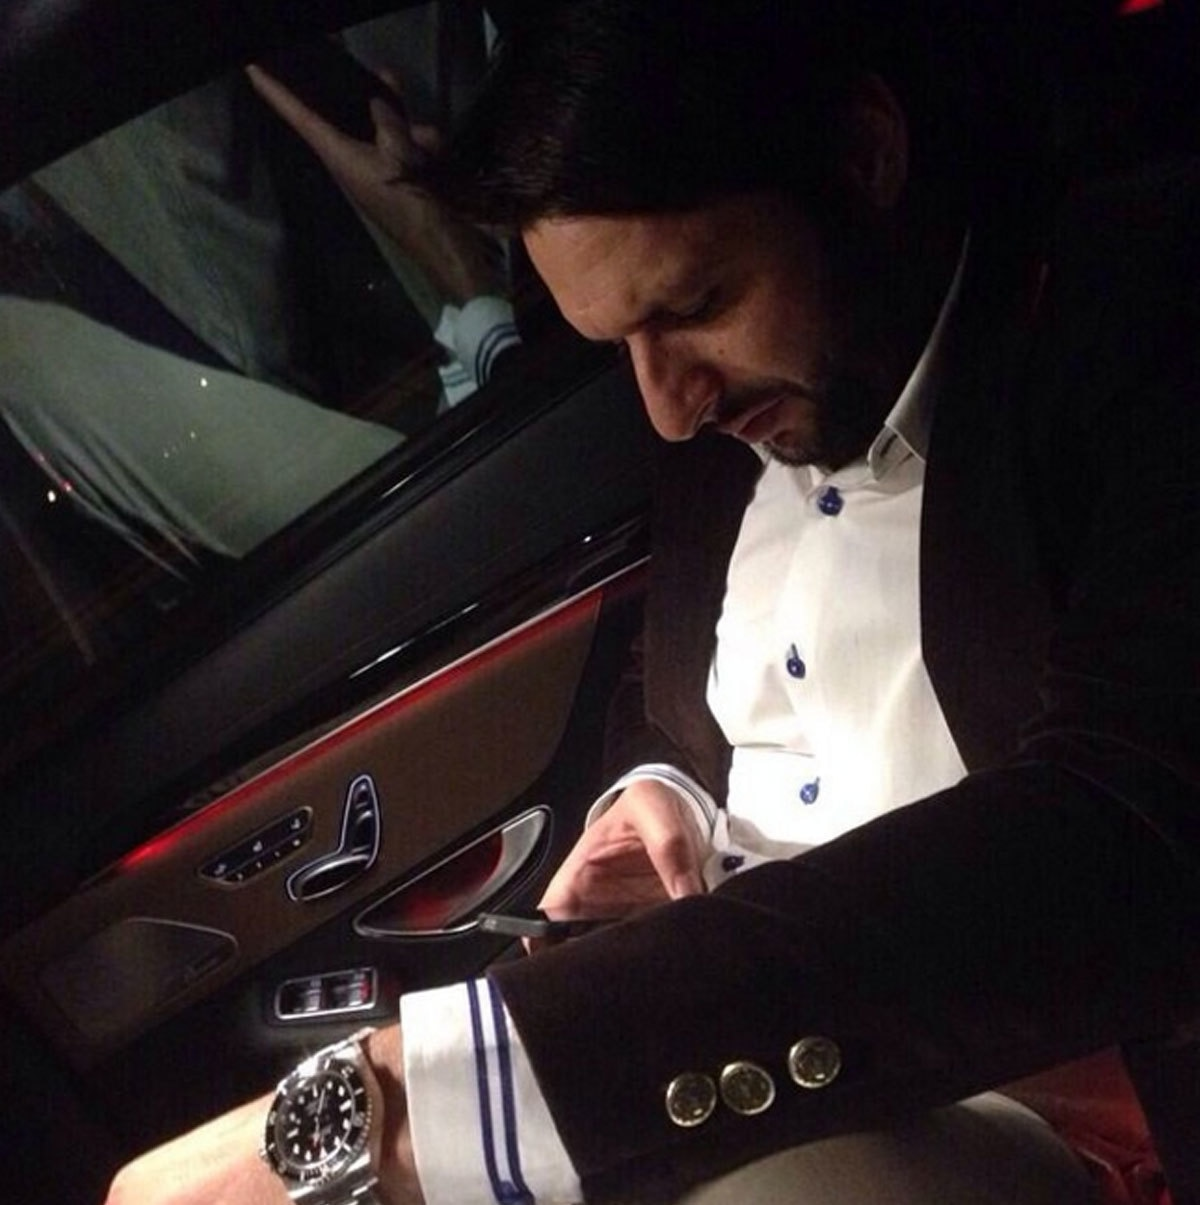 Don Corleone in the making? - Instagram